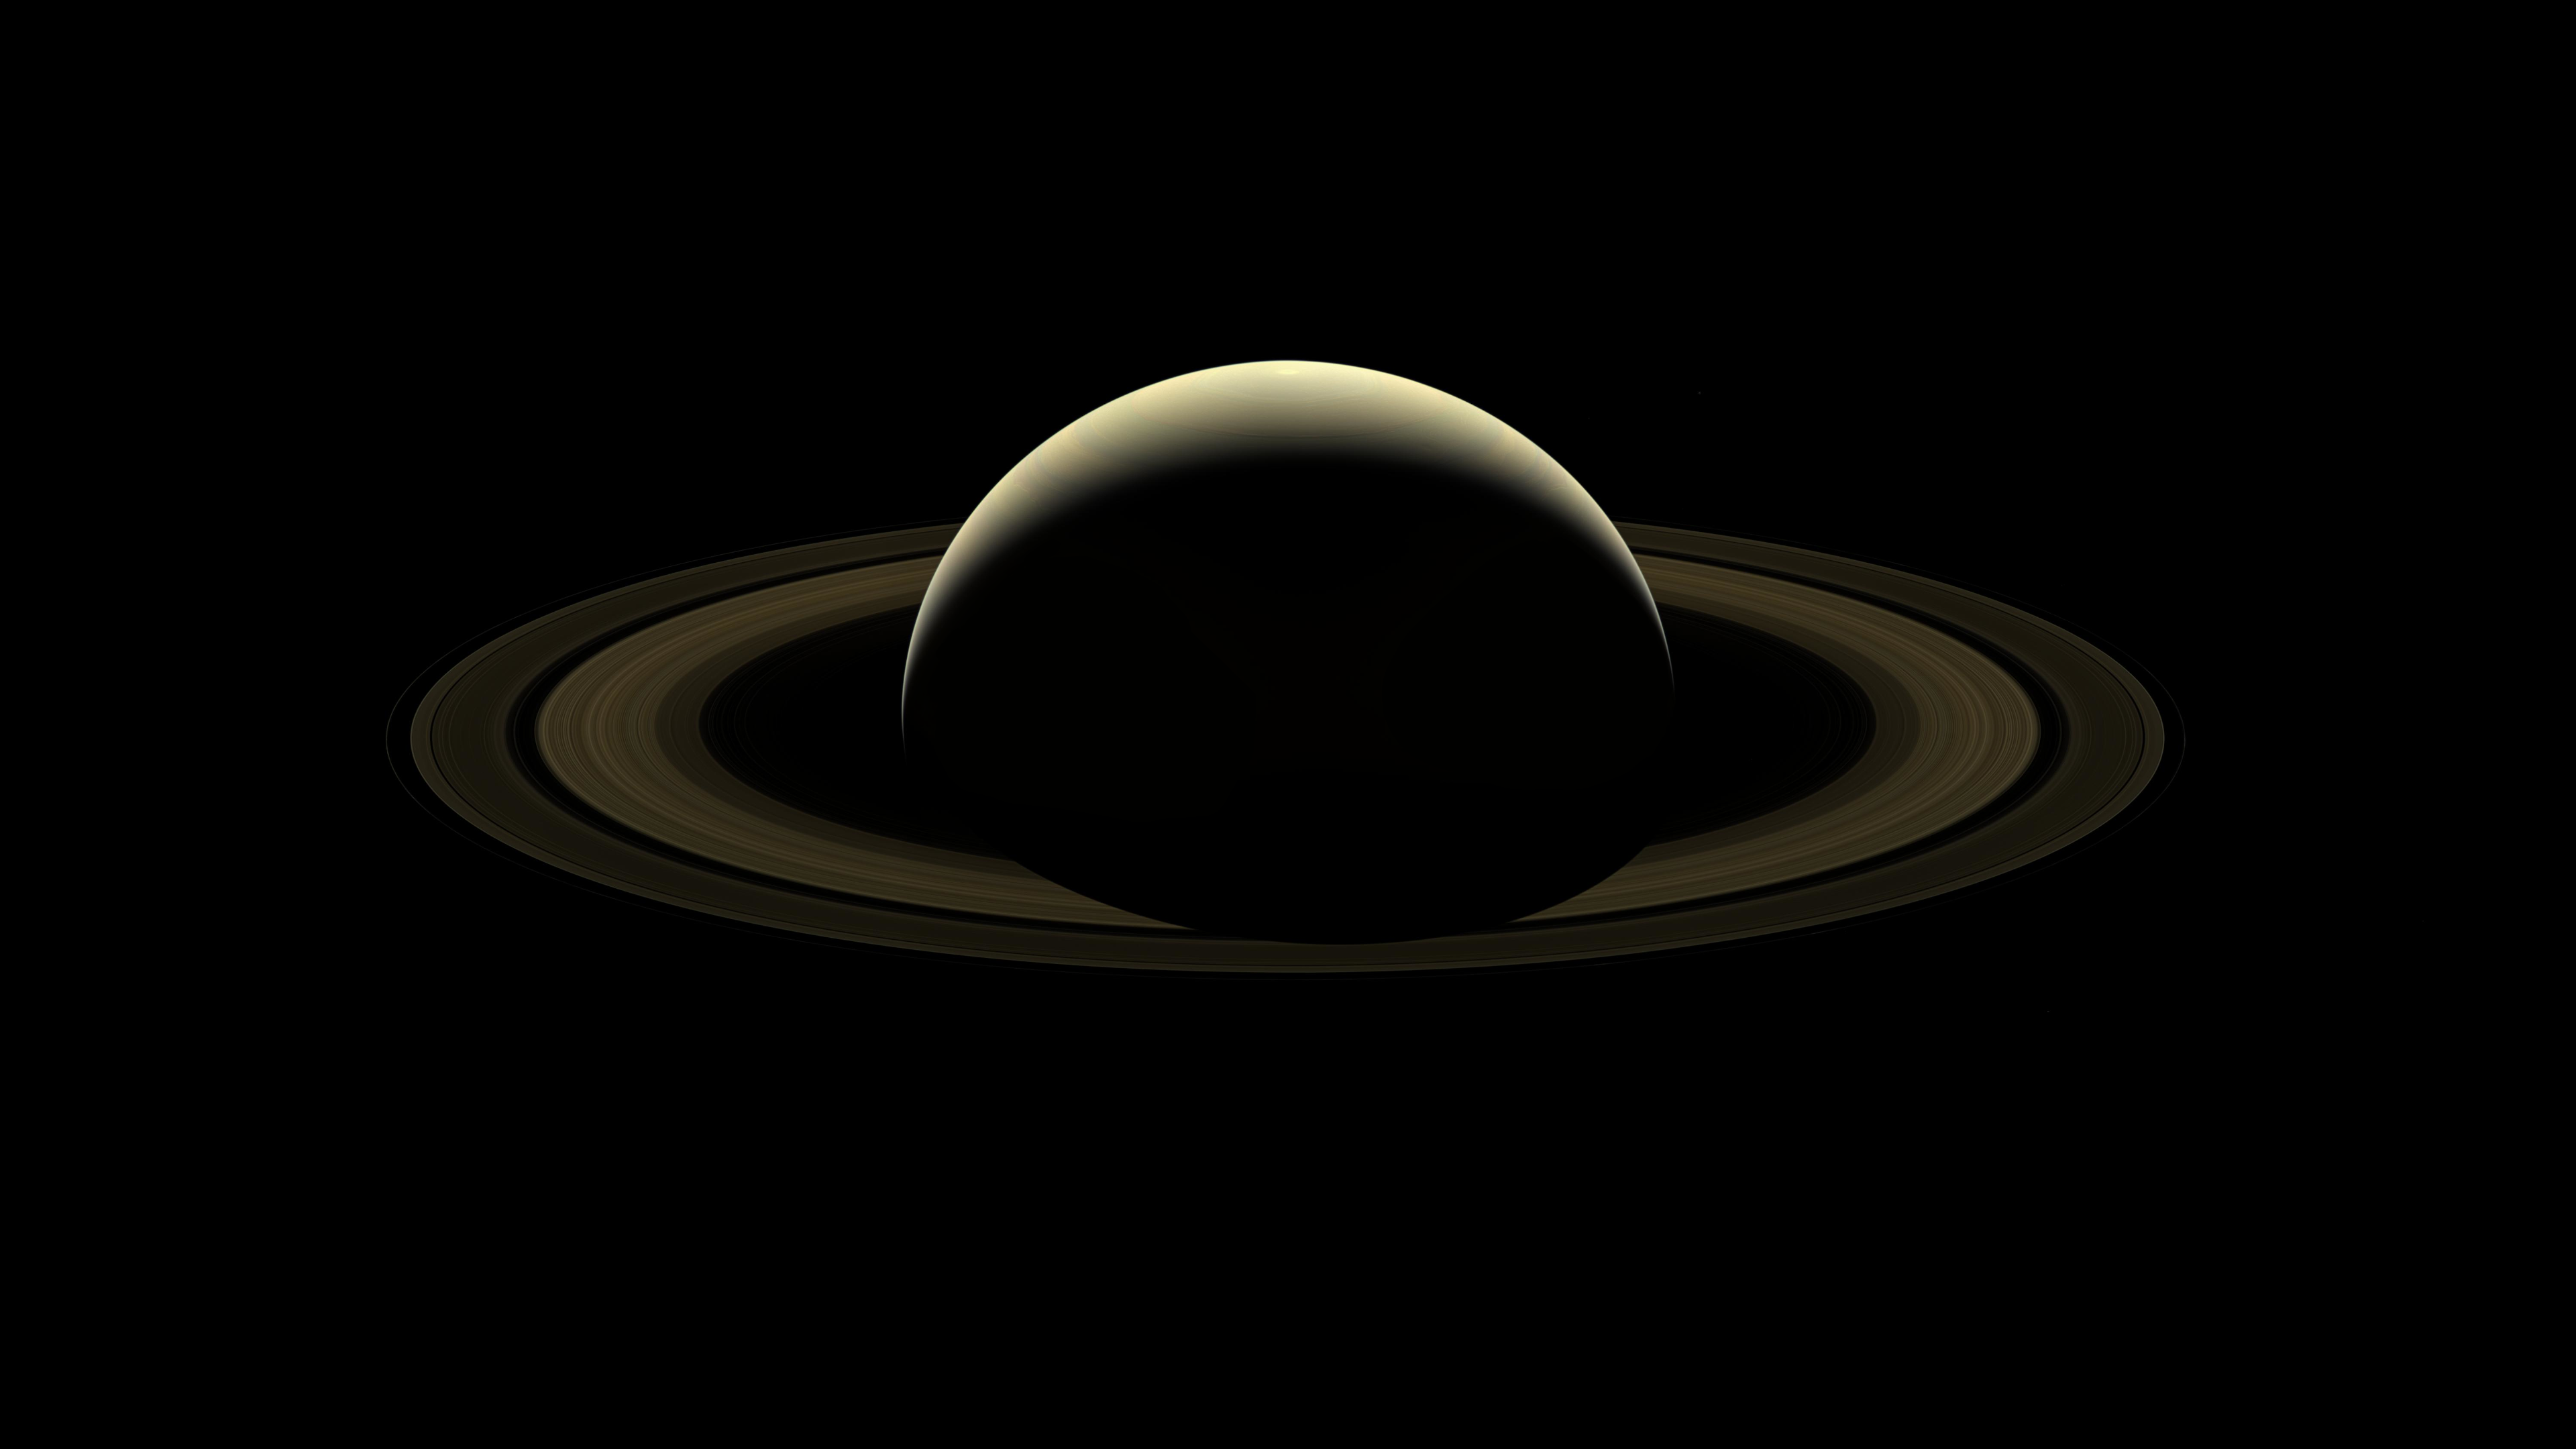 General 3840x2160 planet space NASA nature Saturn Solar System dark background minimalism